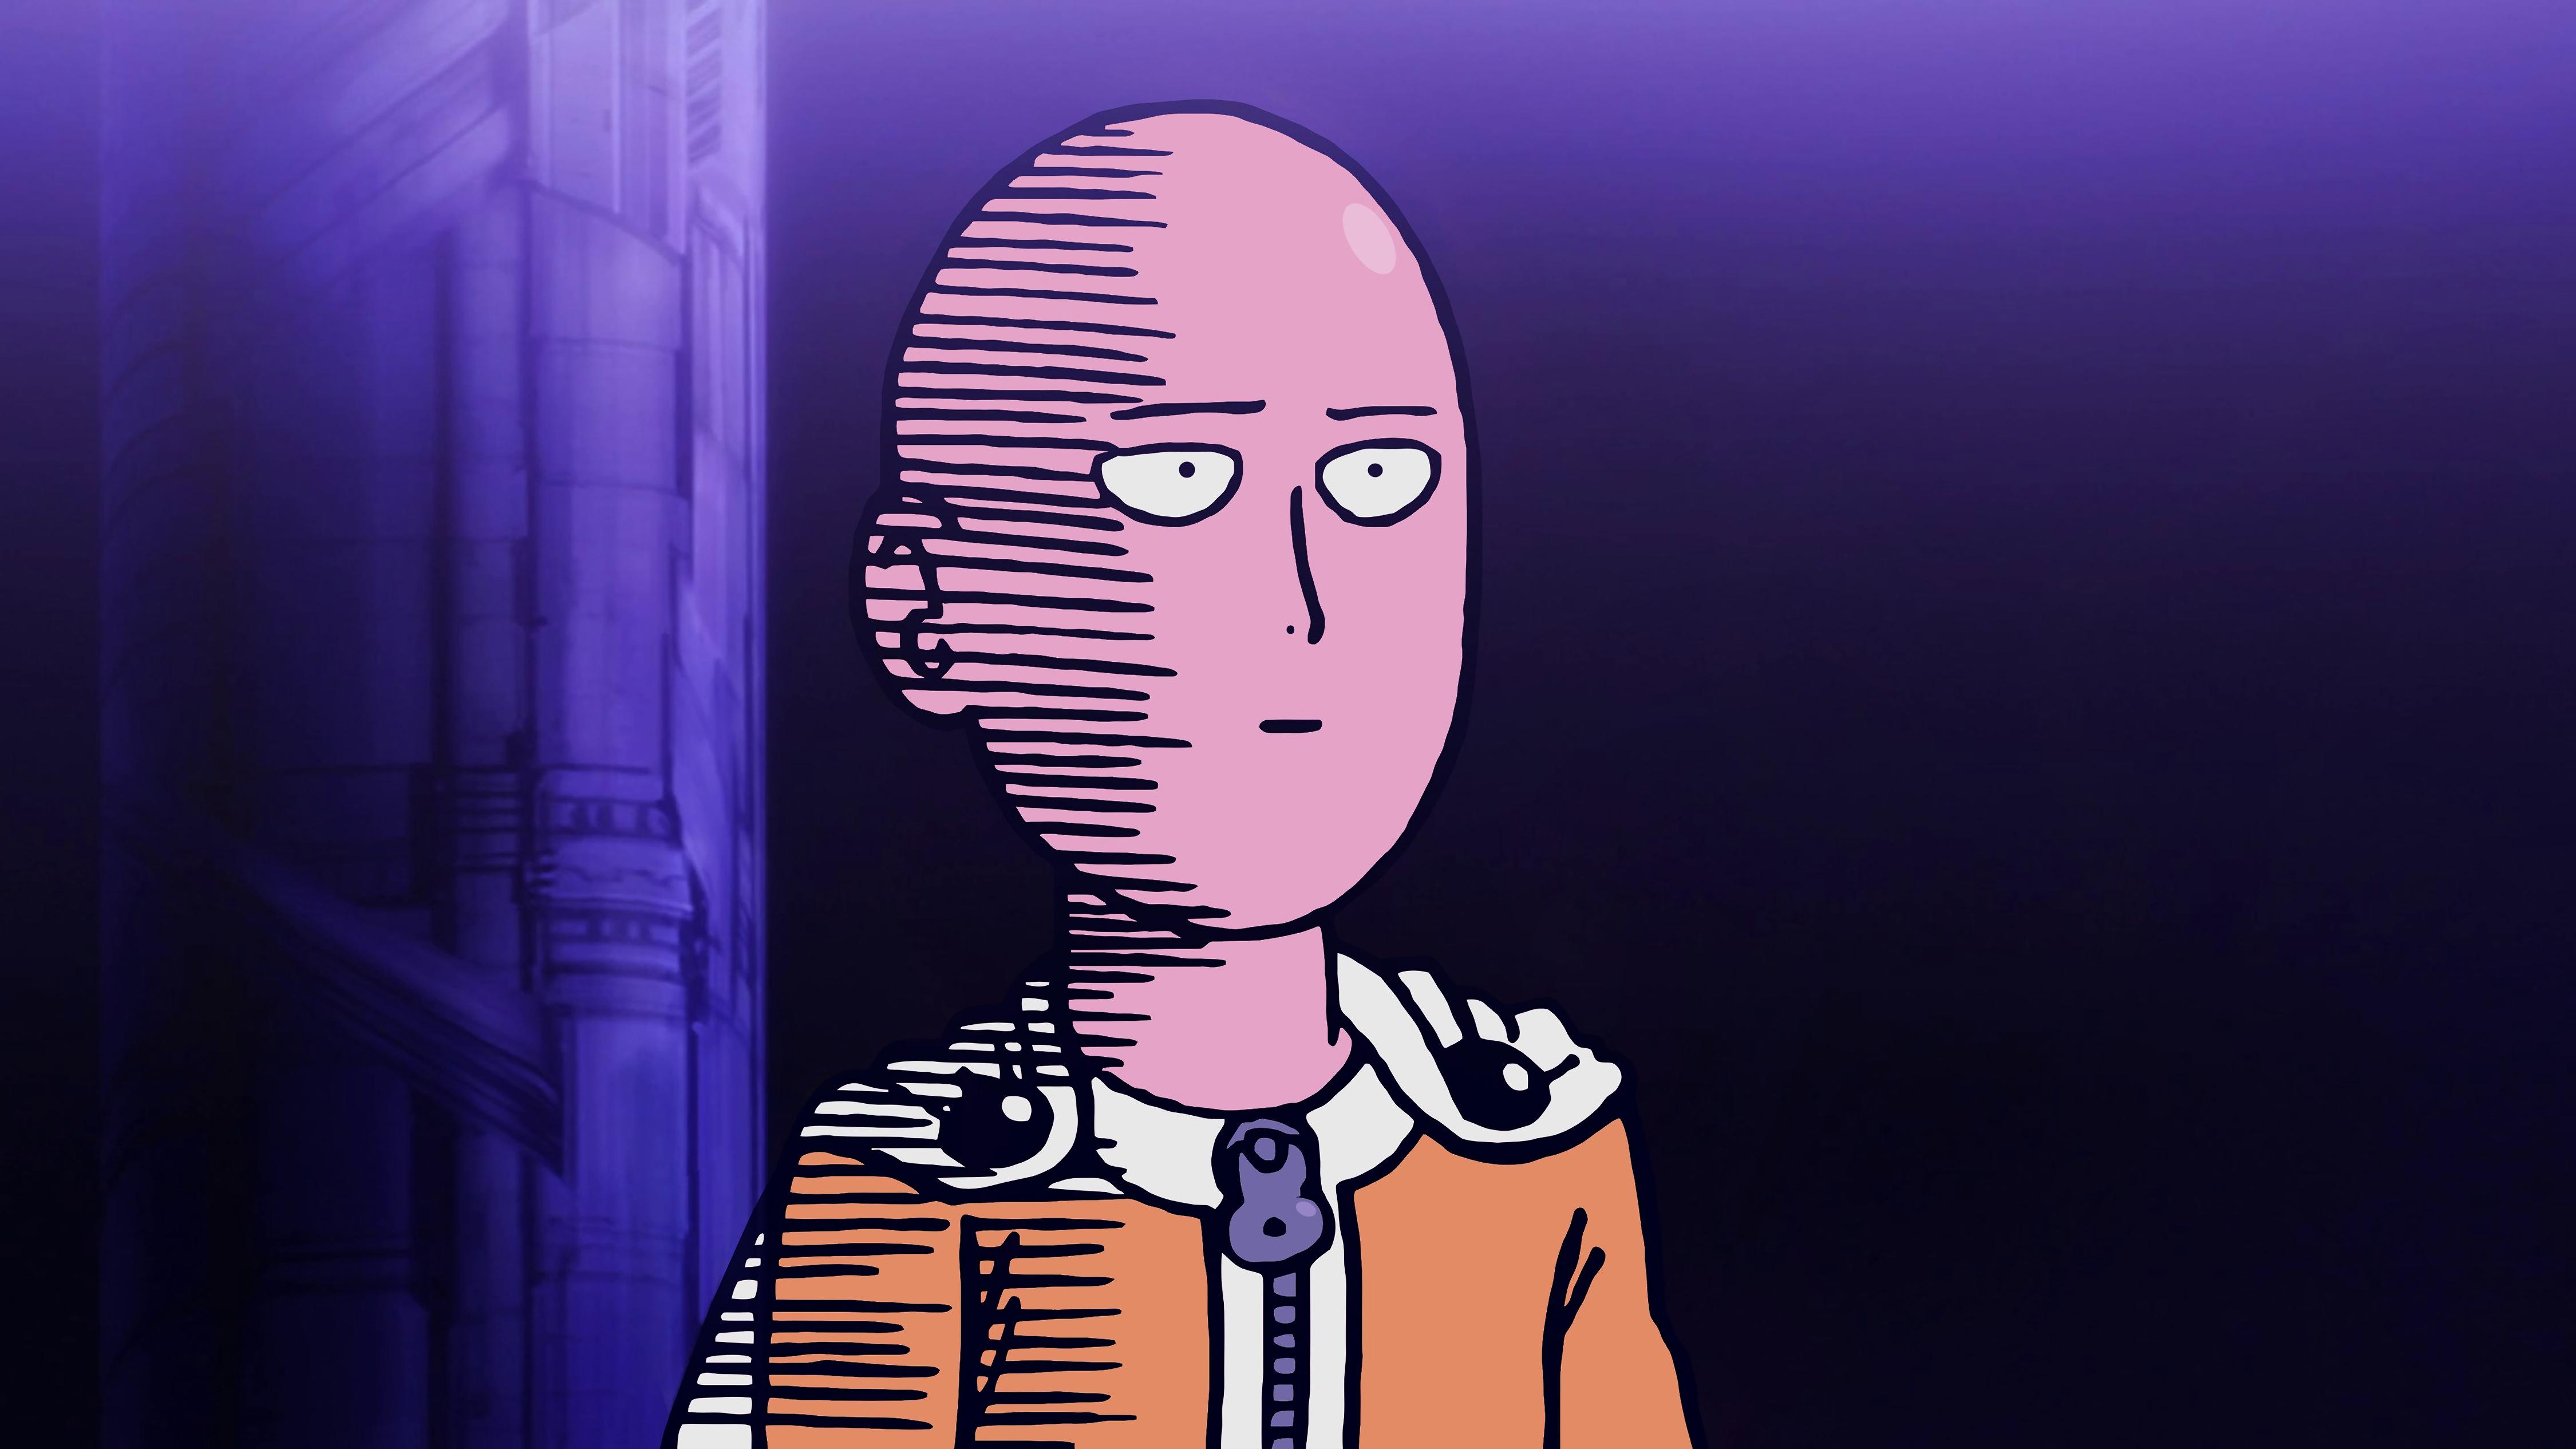 Anime 4500x2531 One-Punch Man anime Saitama